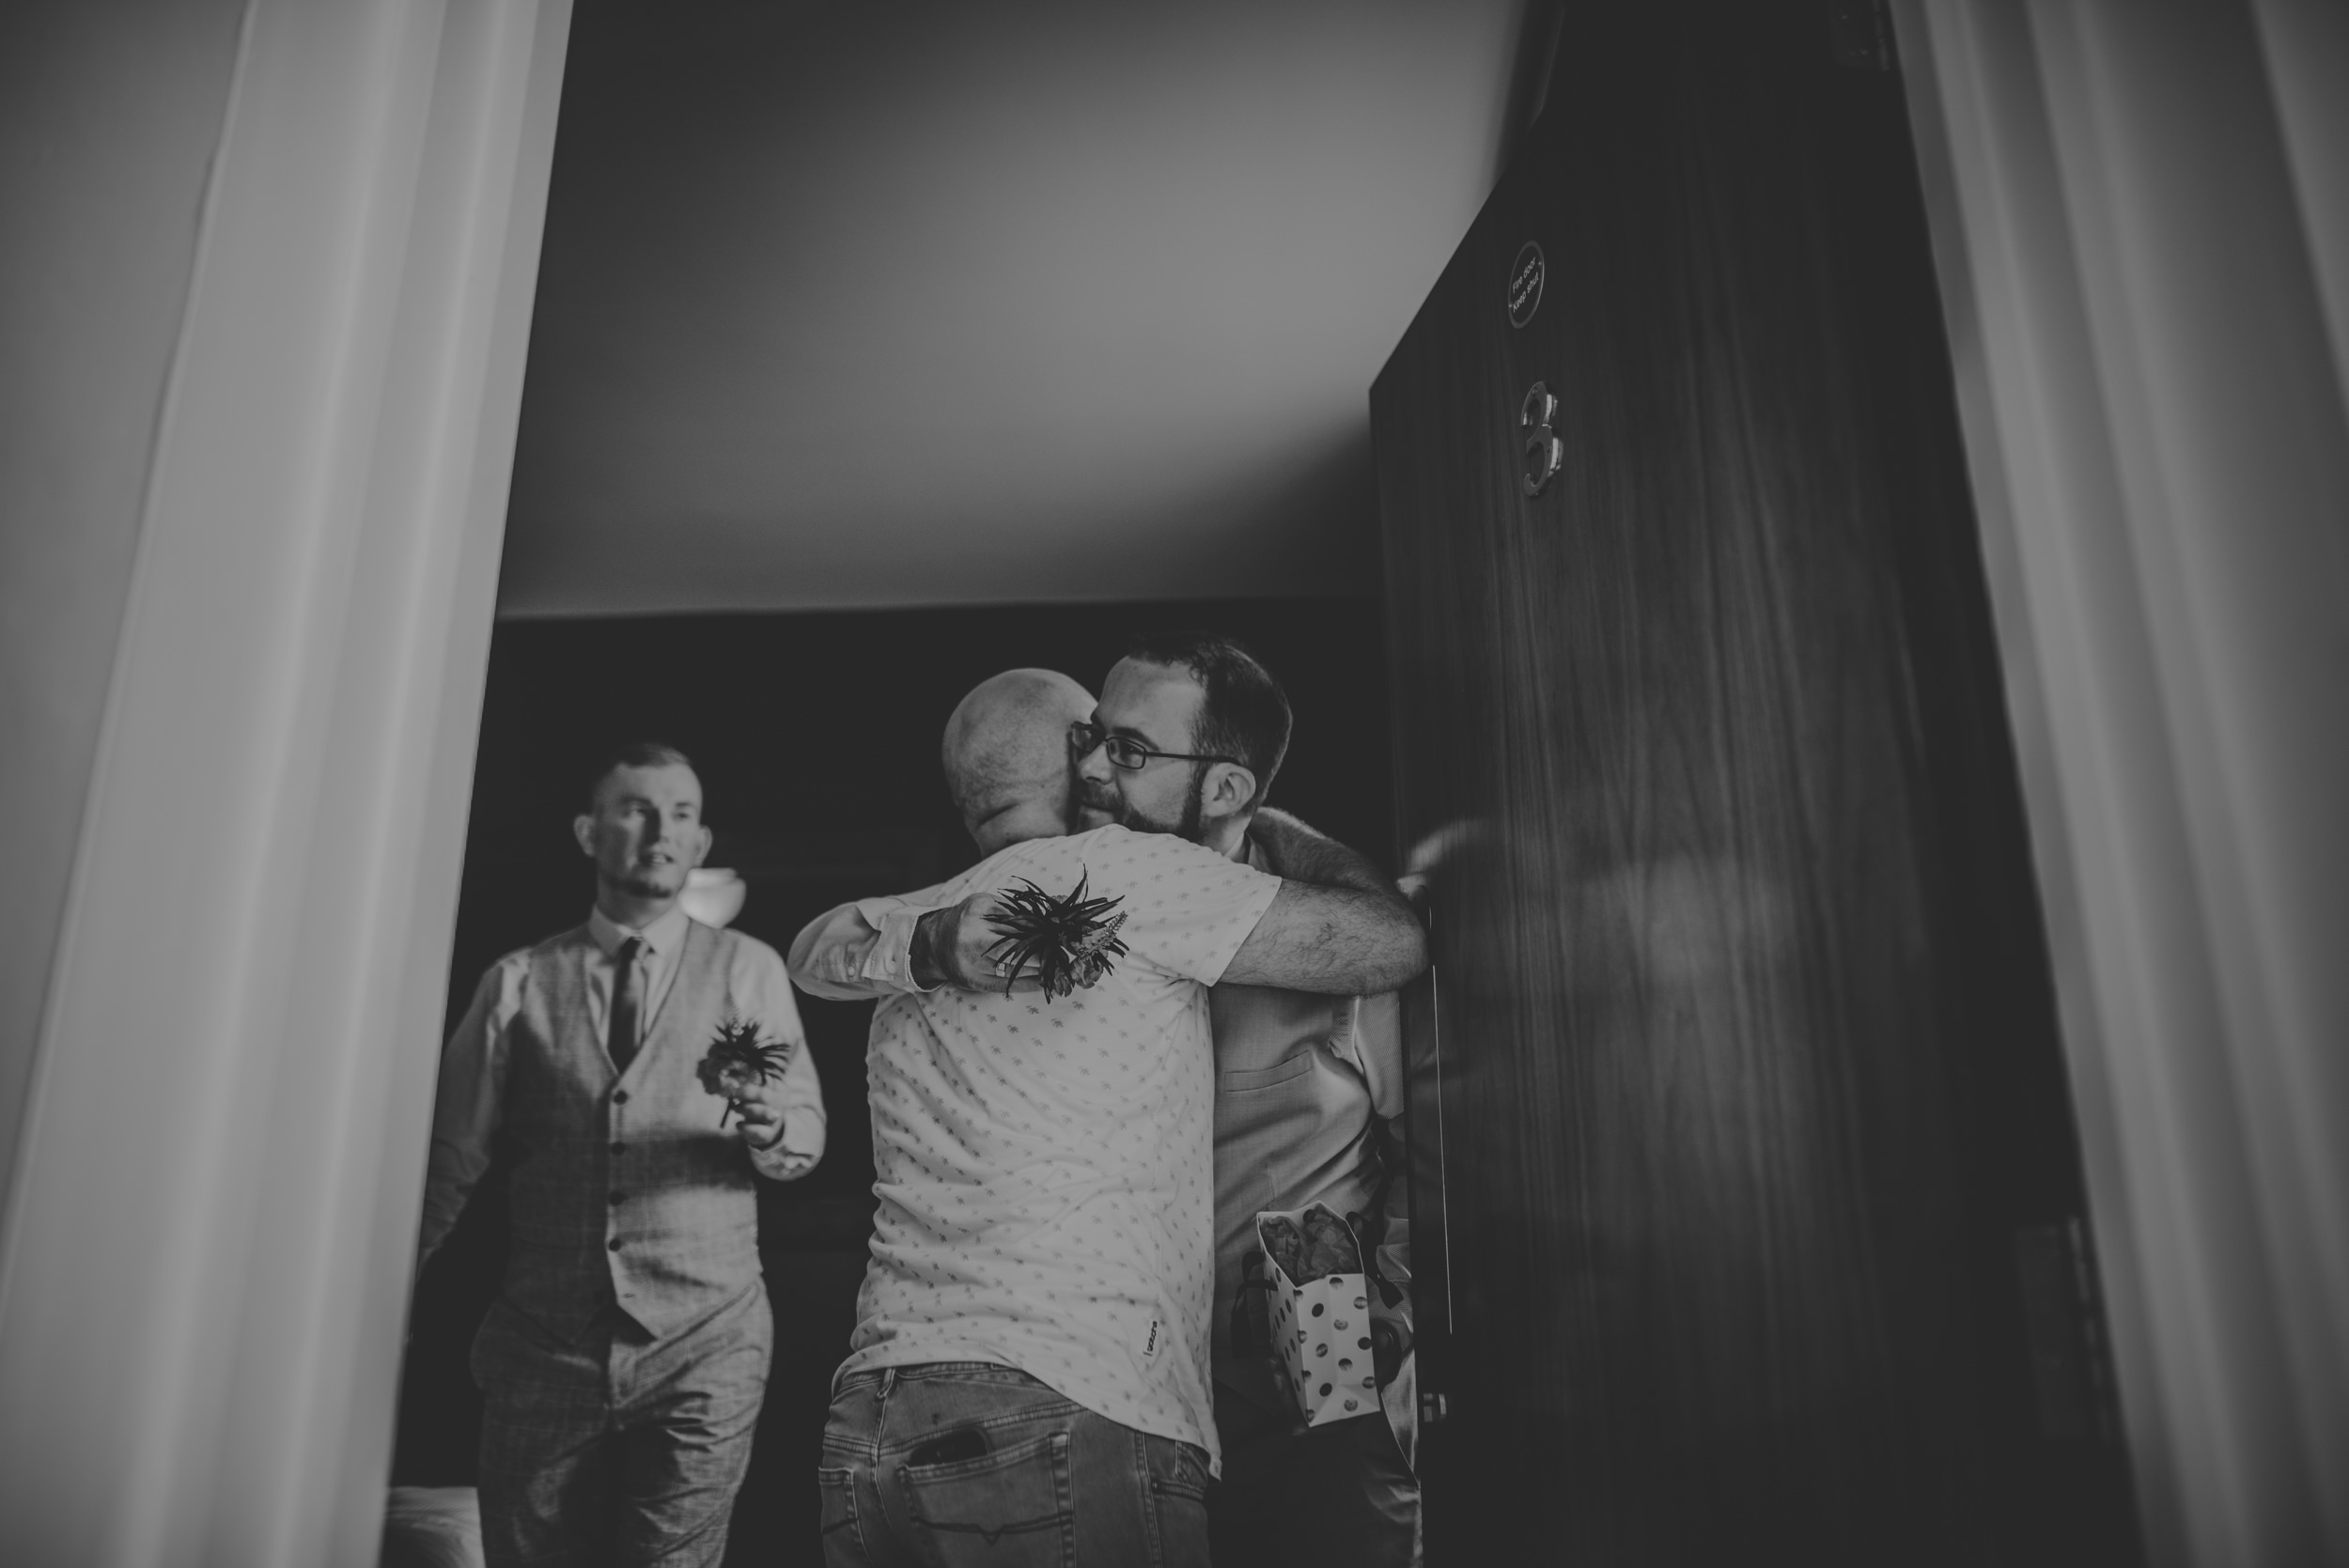 Barry-and-Chaz-wedding-Wasing-Park-Berkshire-Manu-Mendoza-Wedding-Photography-109.jpg